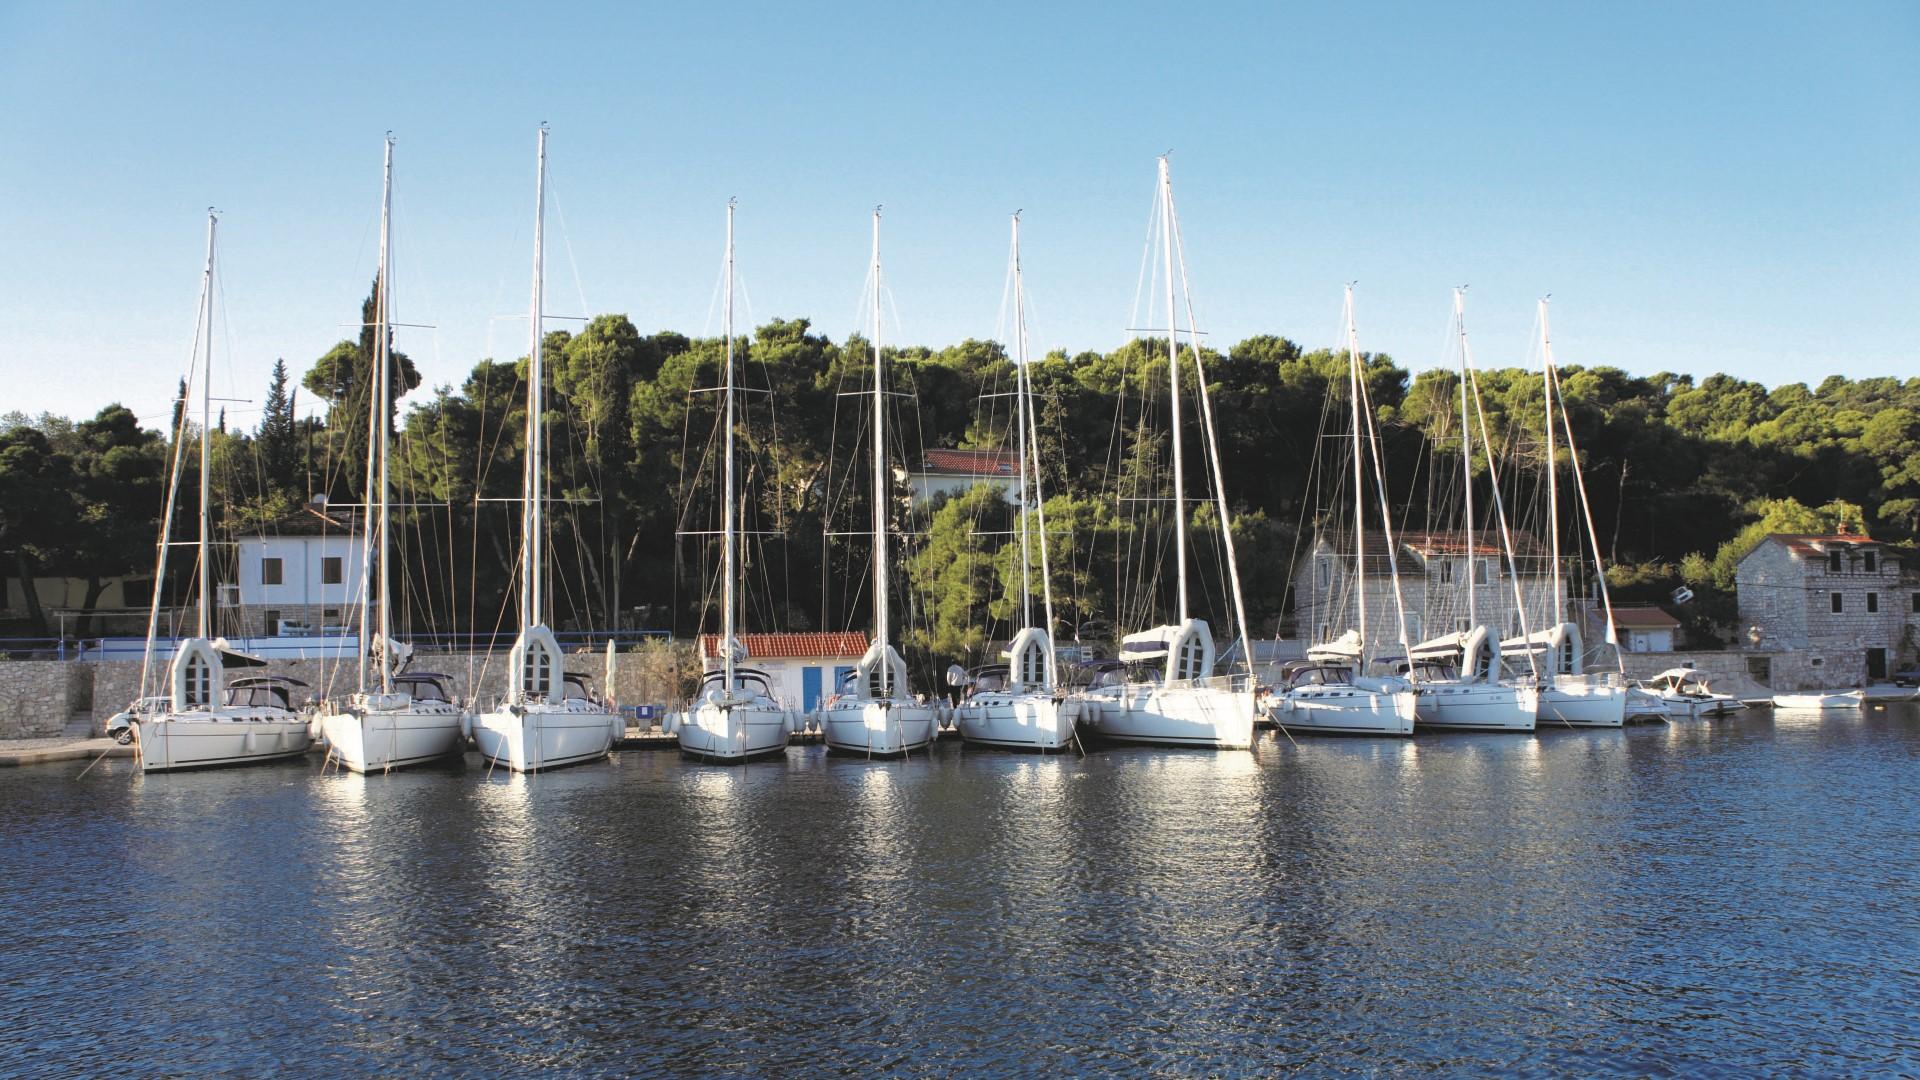 Beneteau Cyclades 39.3 (PHAROS) Marina Rogač - sailboats (photo taken 2019) - 5